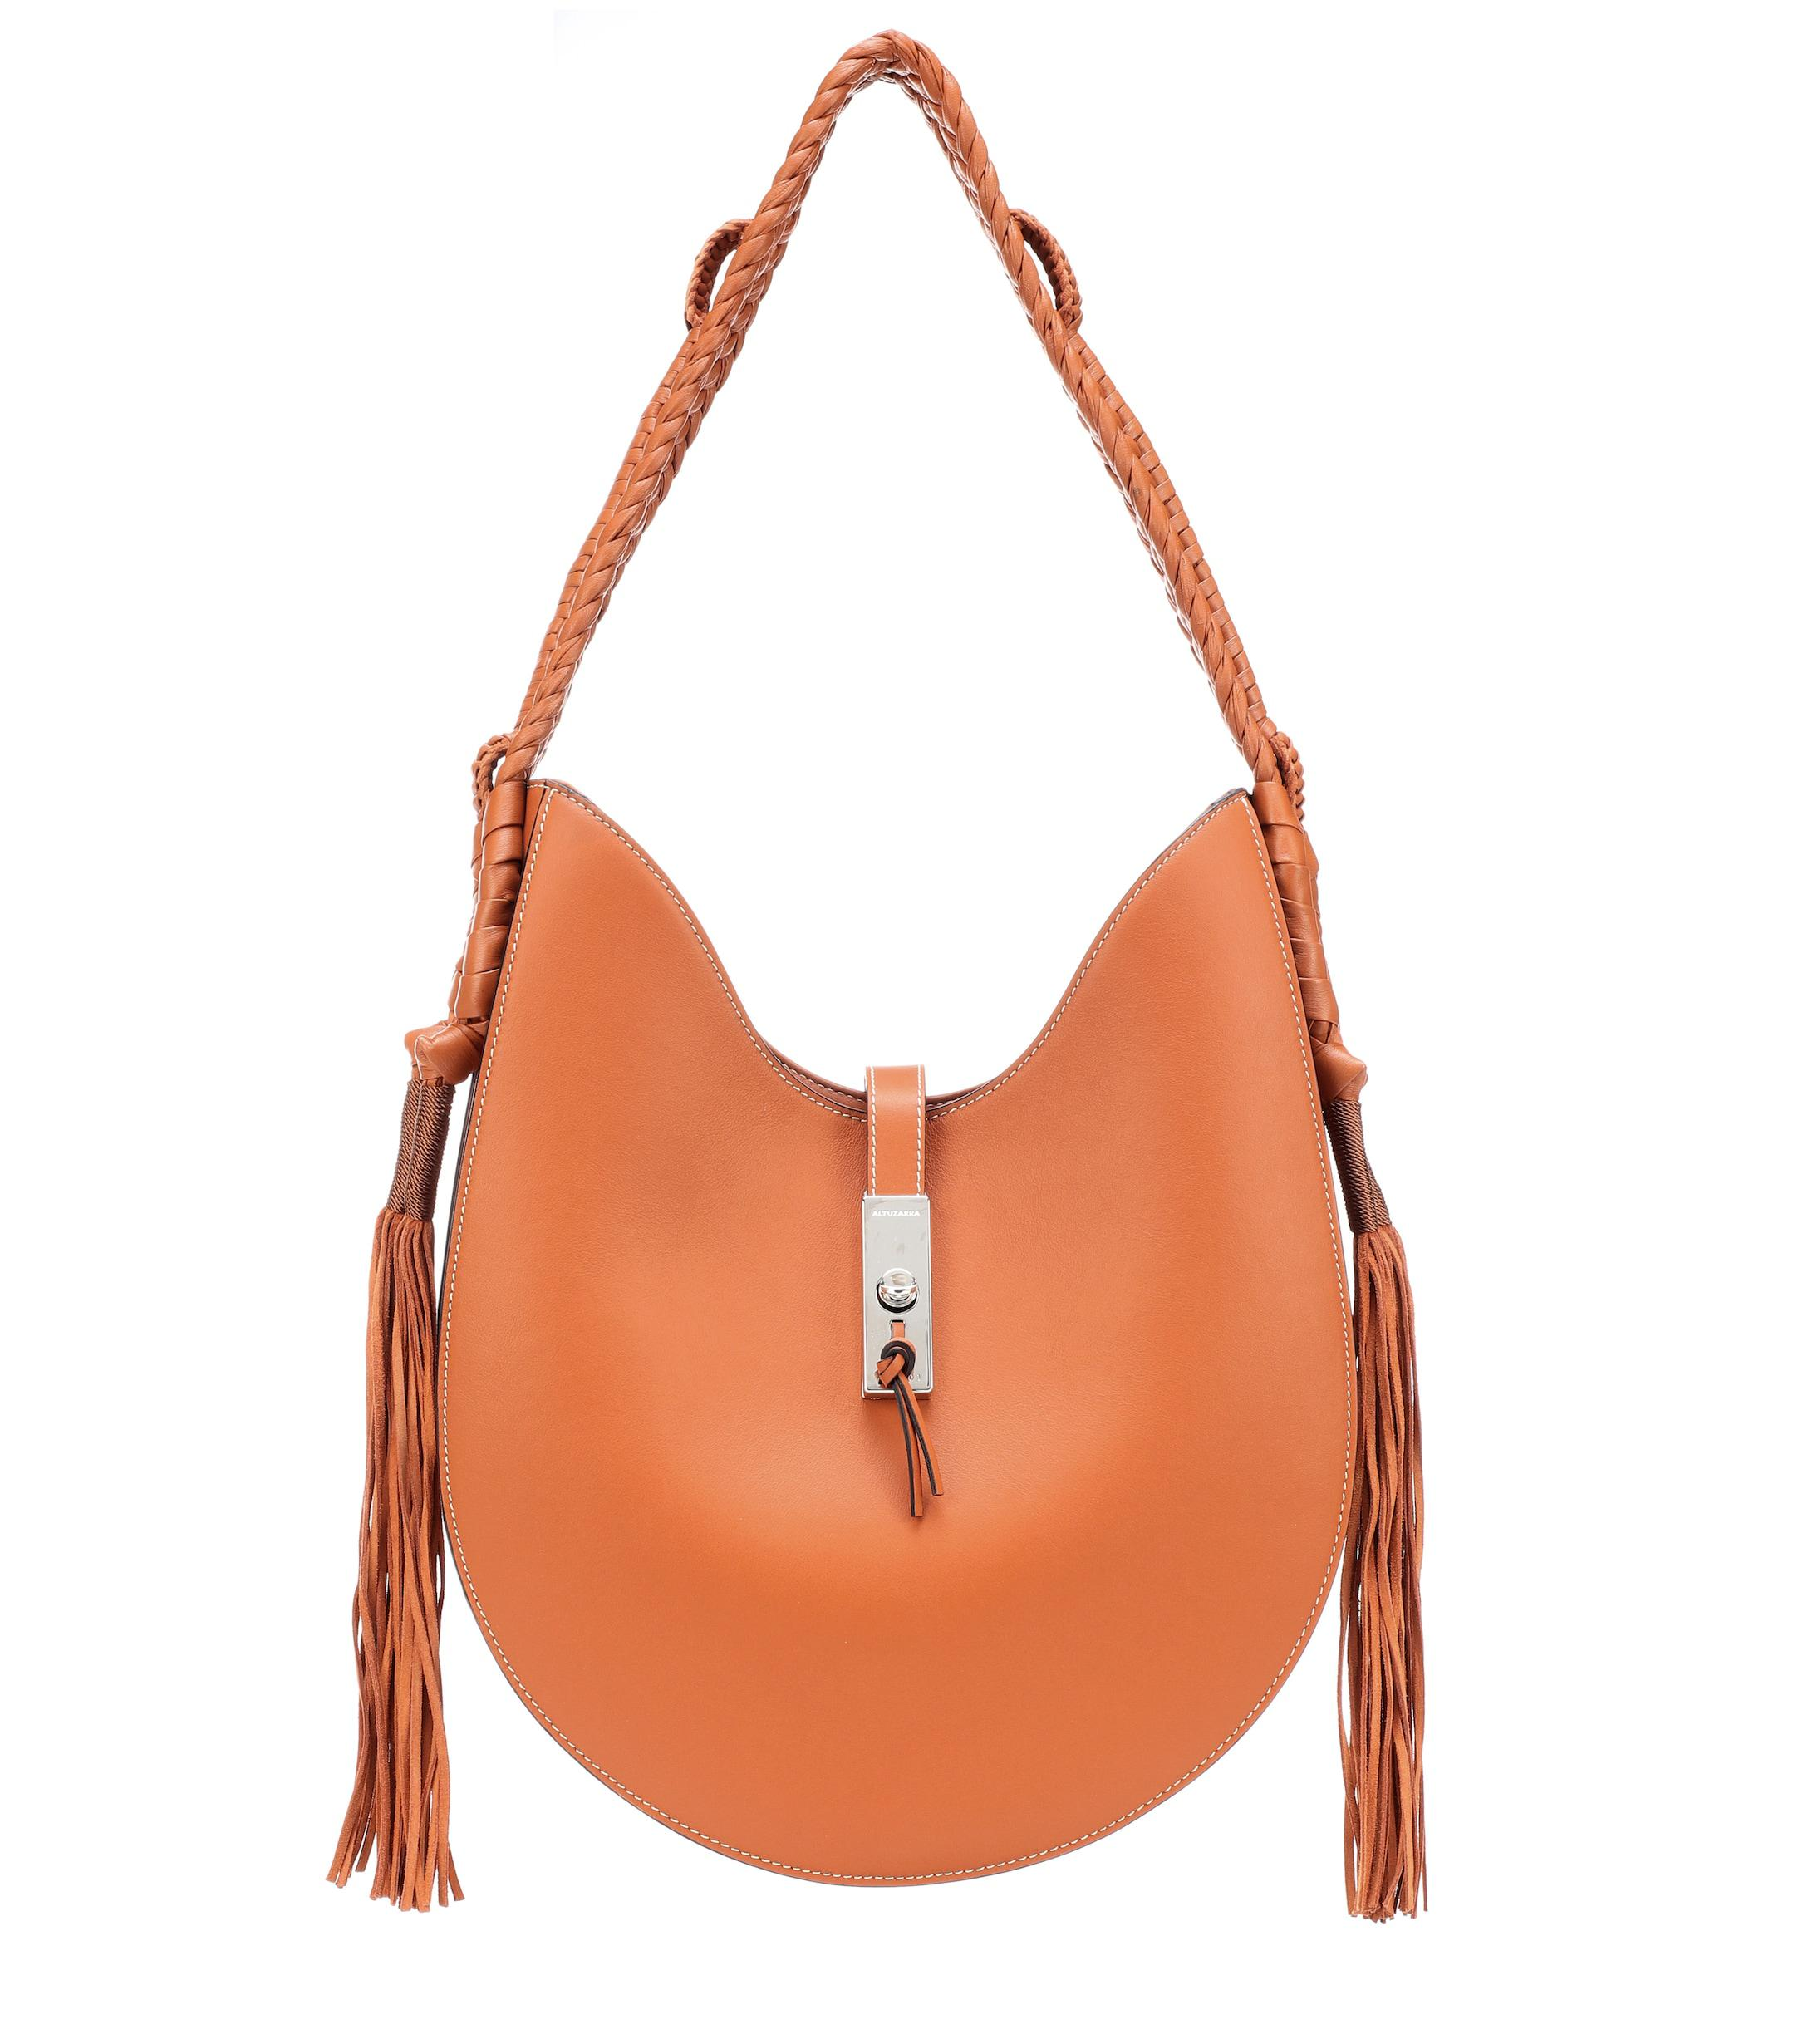 797e500dde84 Altuzarra. Women s Ghianda Large Leather Shoulder Bag